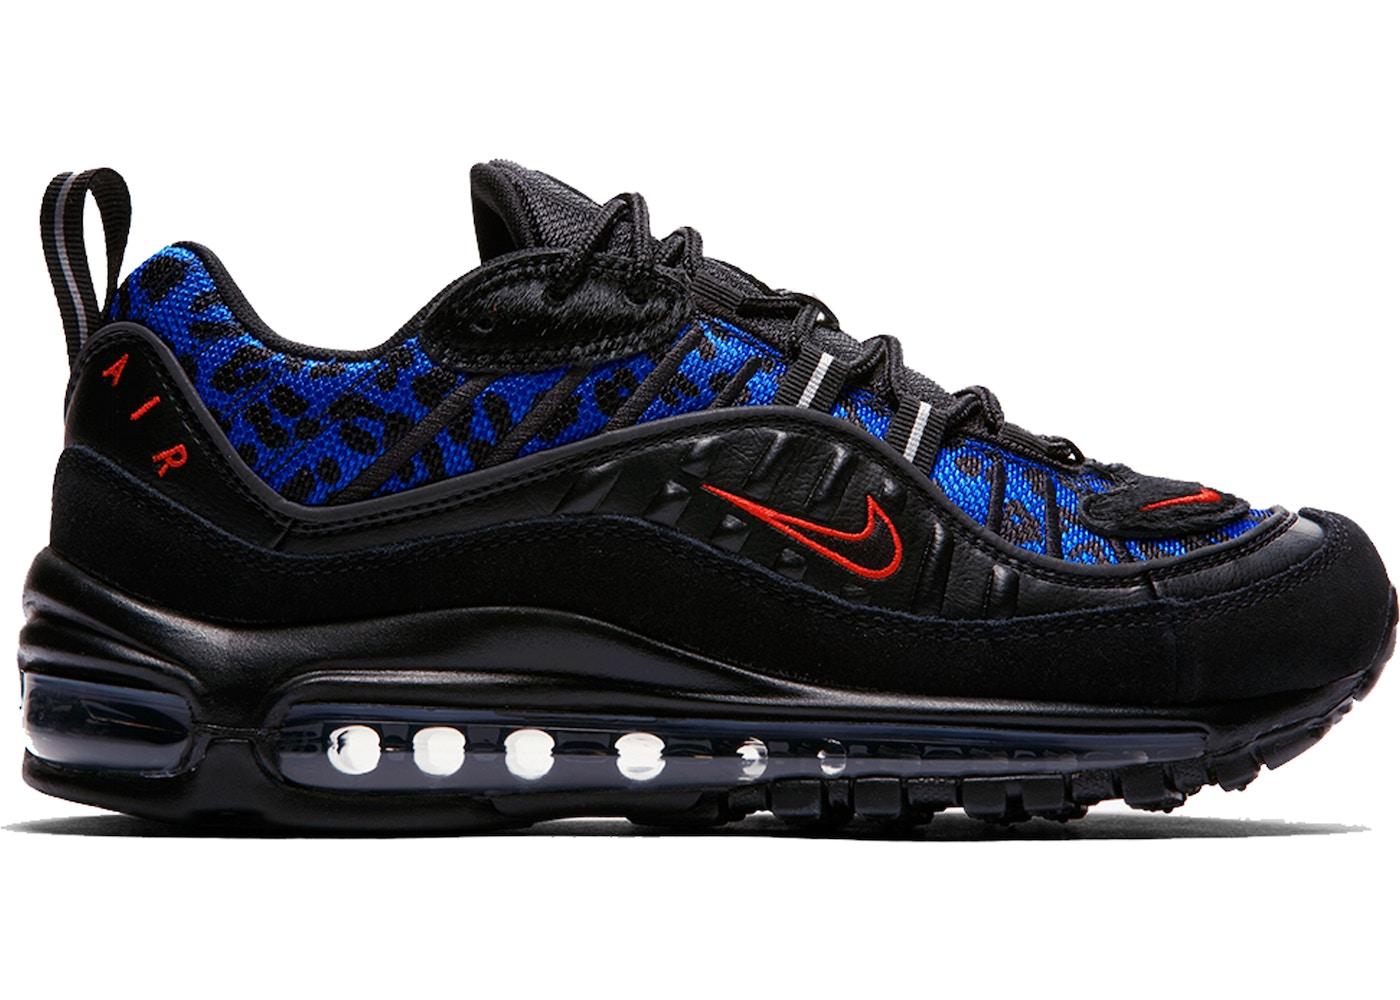 Nike Air Max 98 Black Leopard (W)